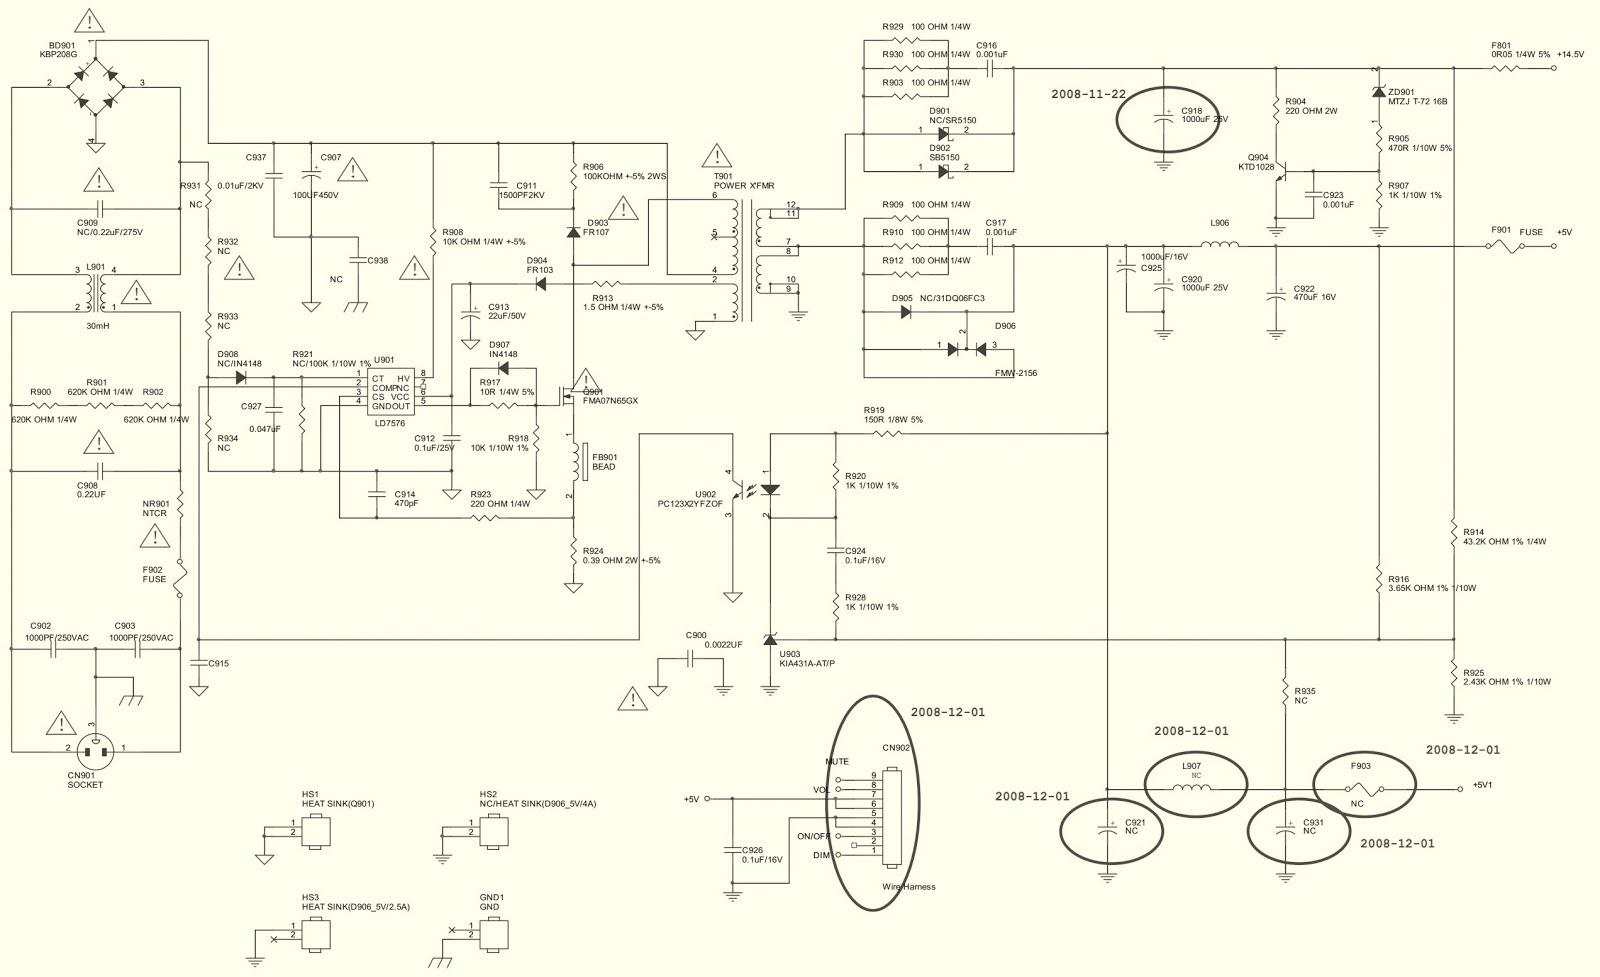 aoc2236vwa lcd monitor circuit diagram 7155g2892 power board dell lcd monitor schematic diagram lcd monitor schematic diagram [ 1600 x 977 Pixel ]